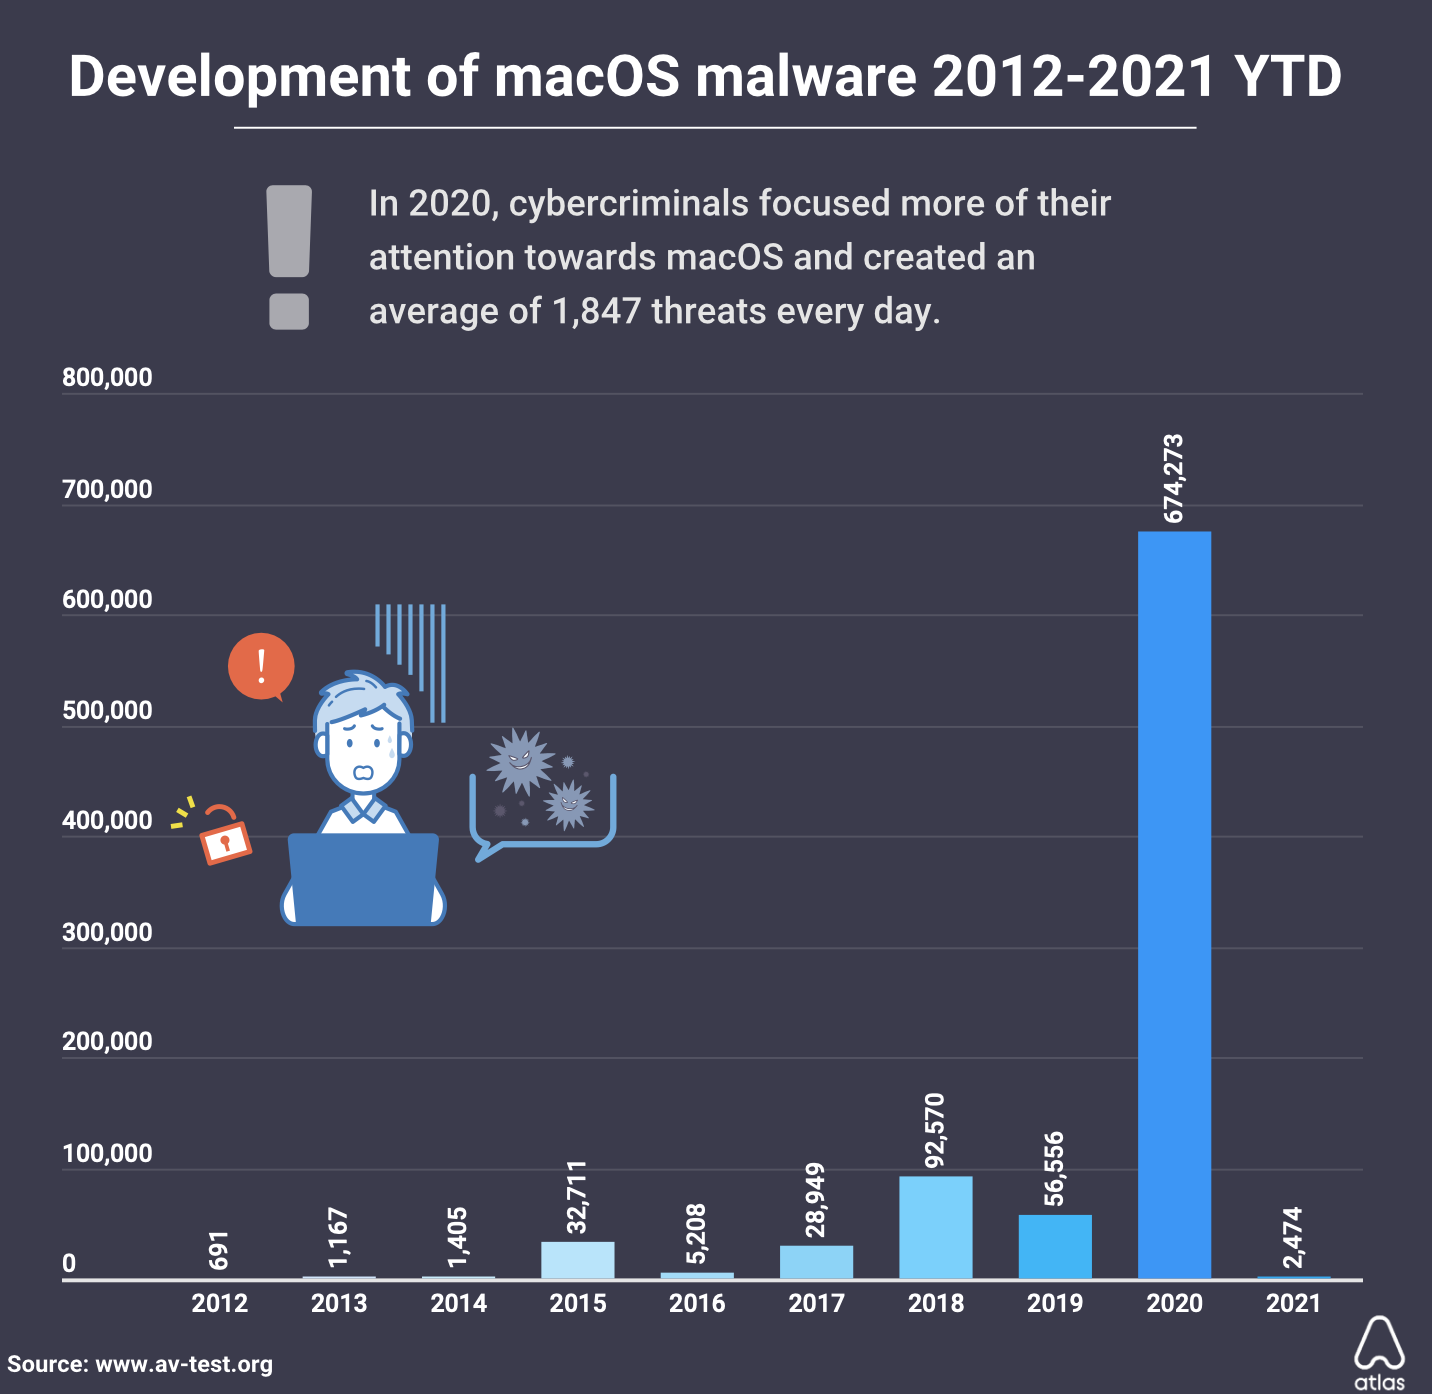 macos malware discovered 2020